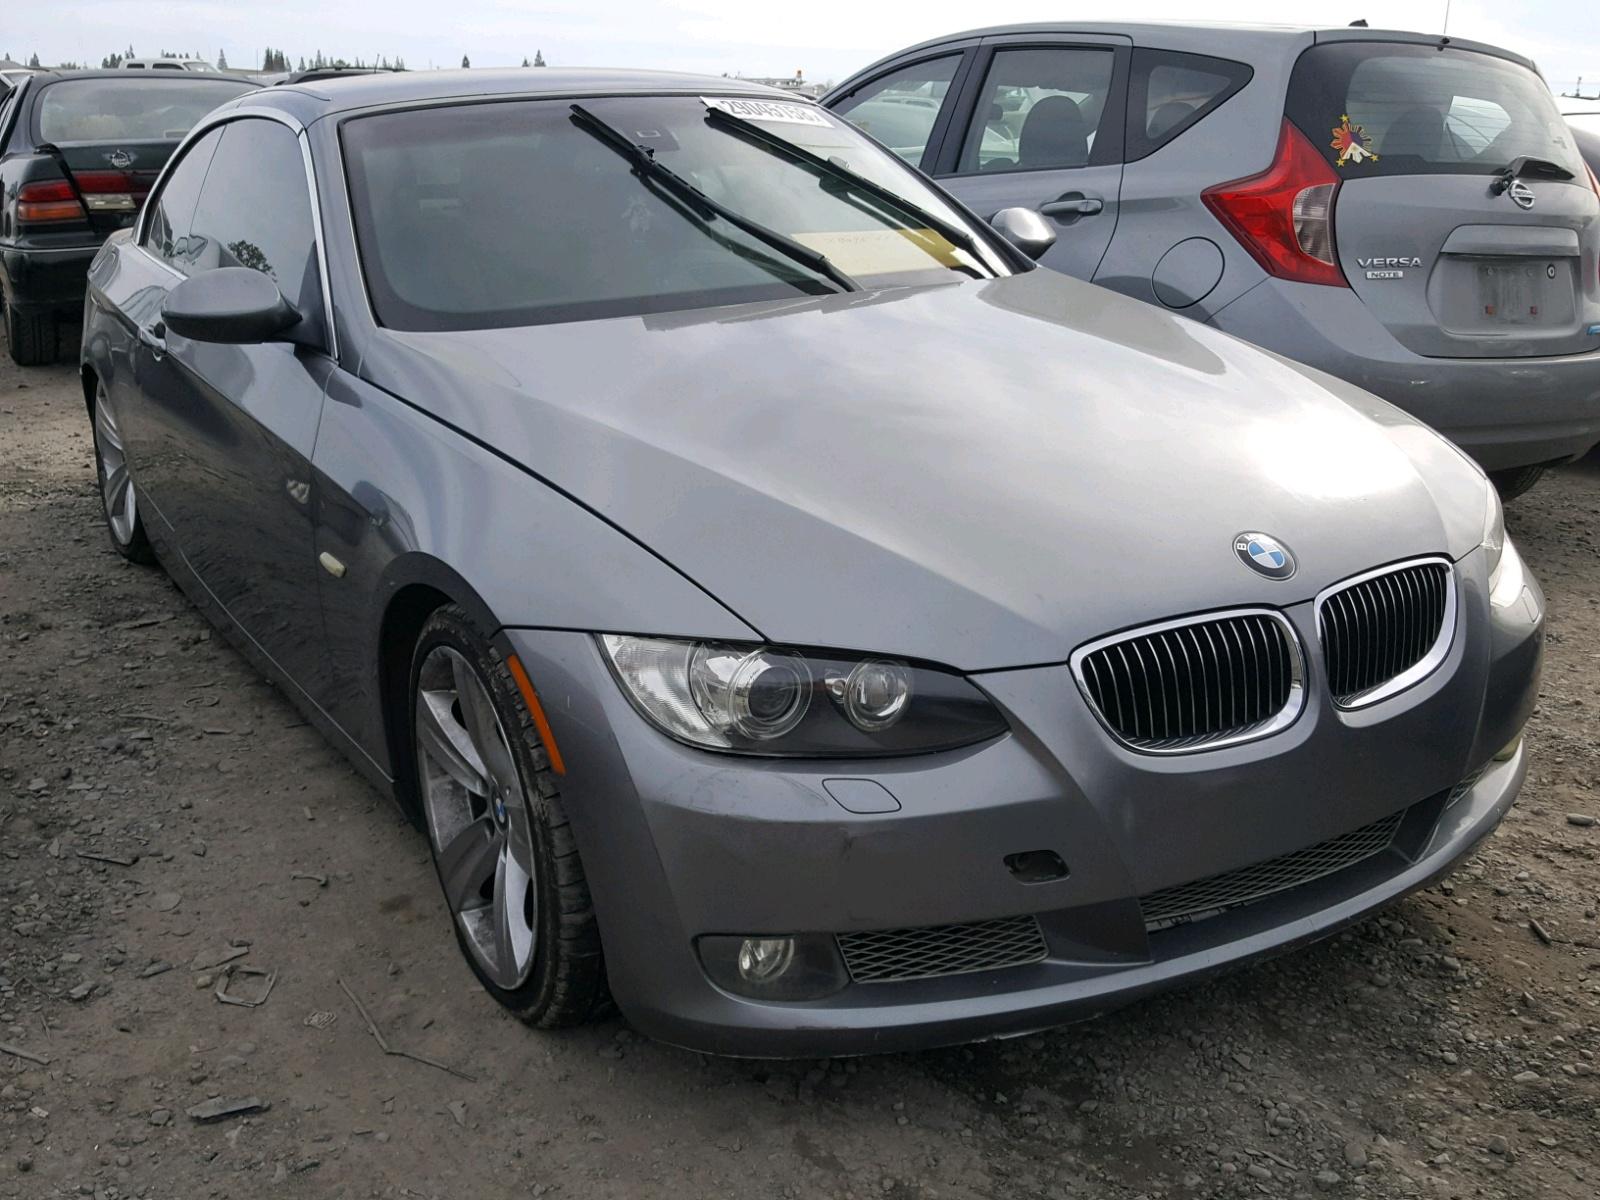 WBAWL73508PX53805 - 2008 BMW 335 I 3.0L Left View